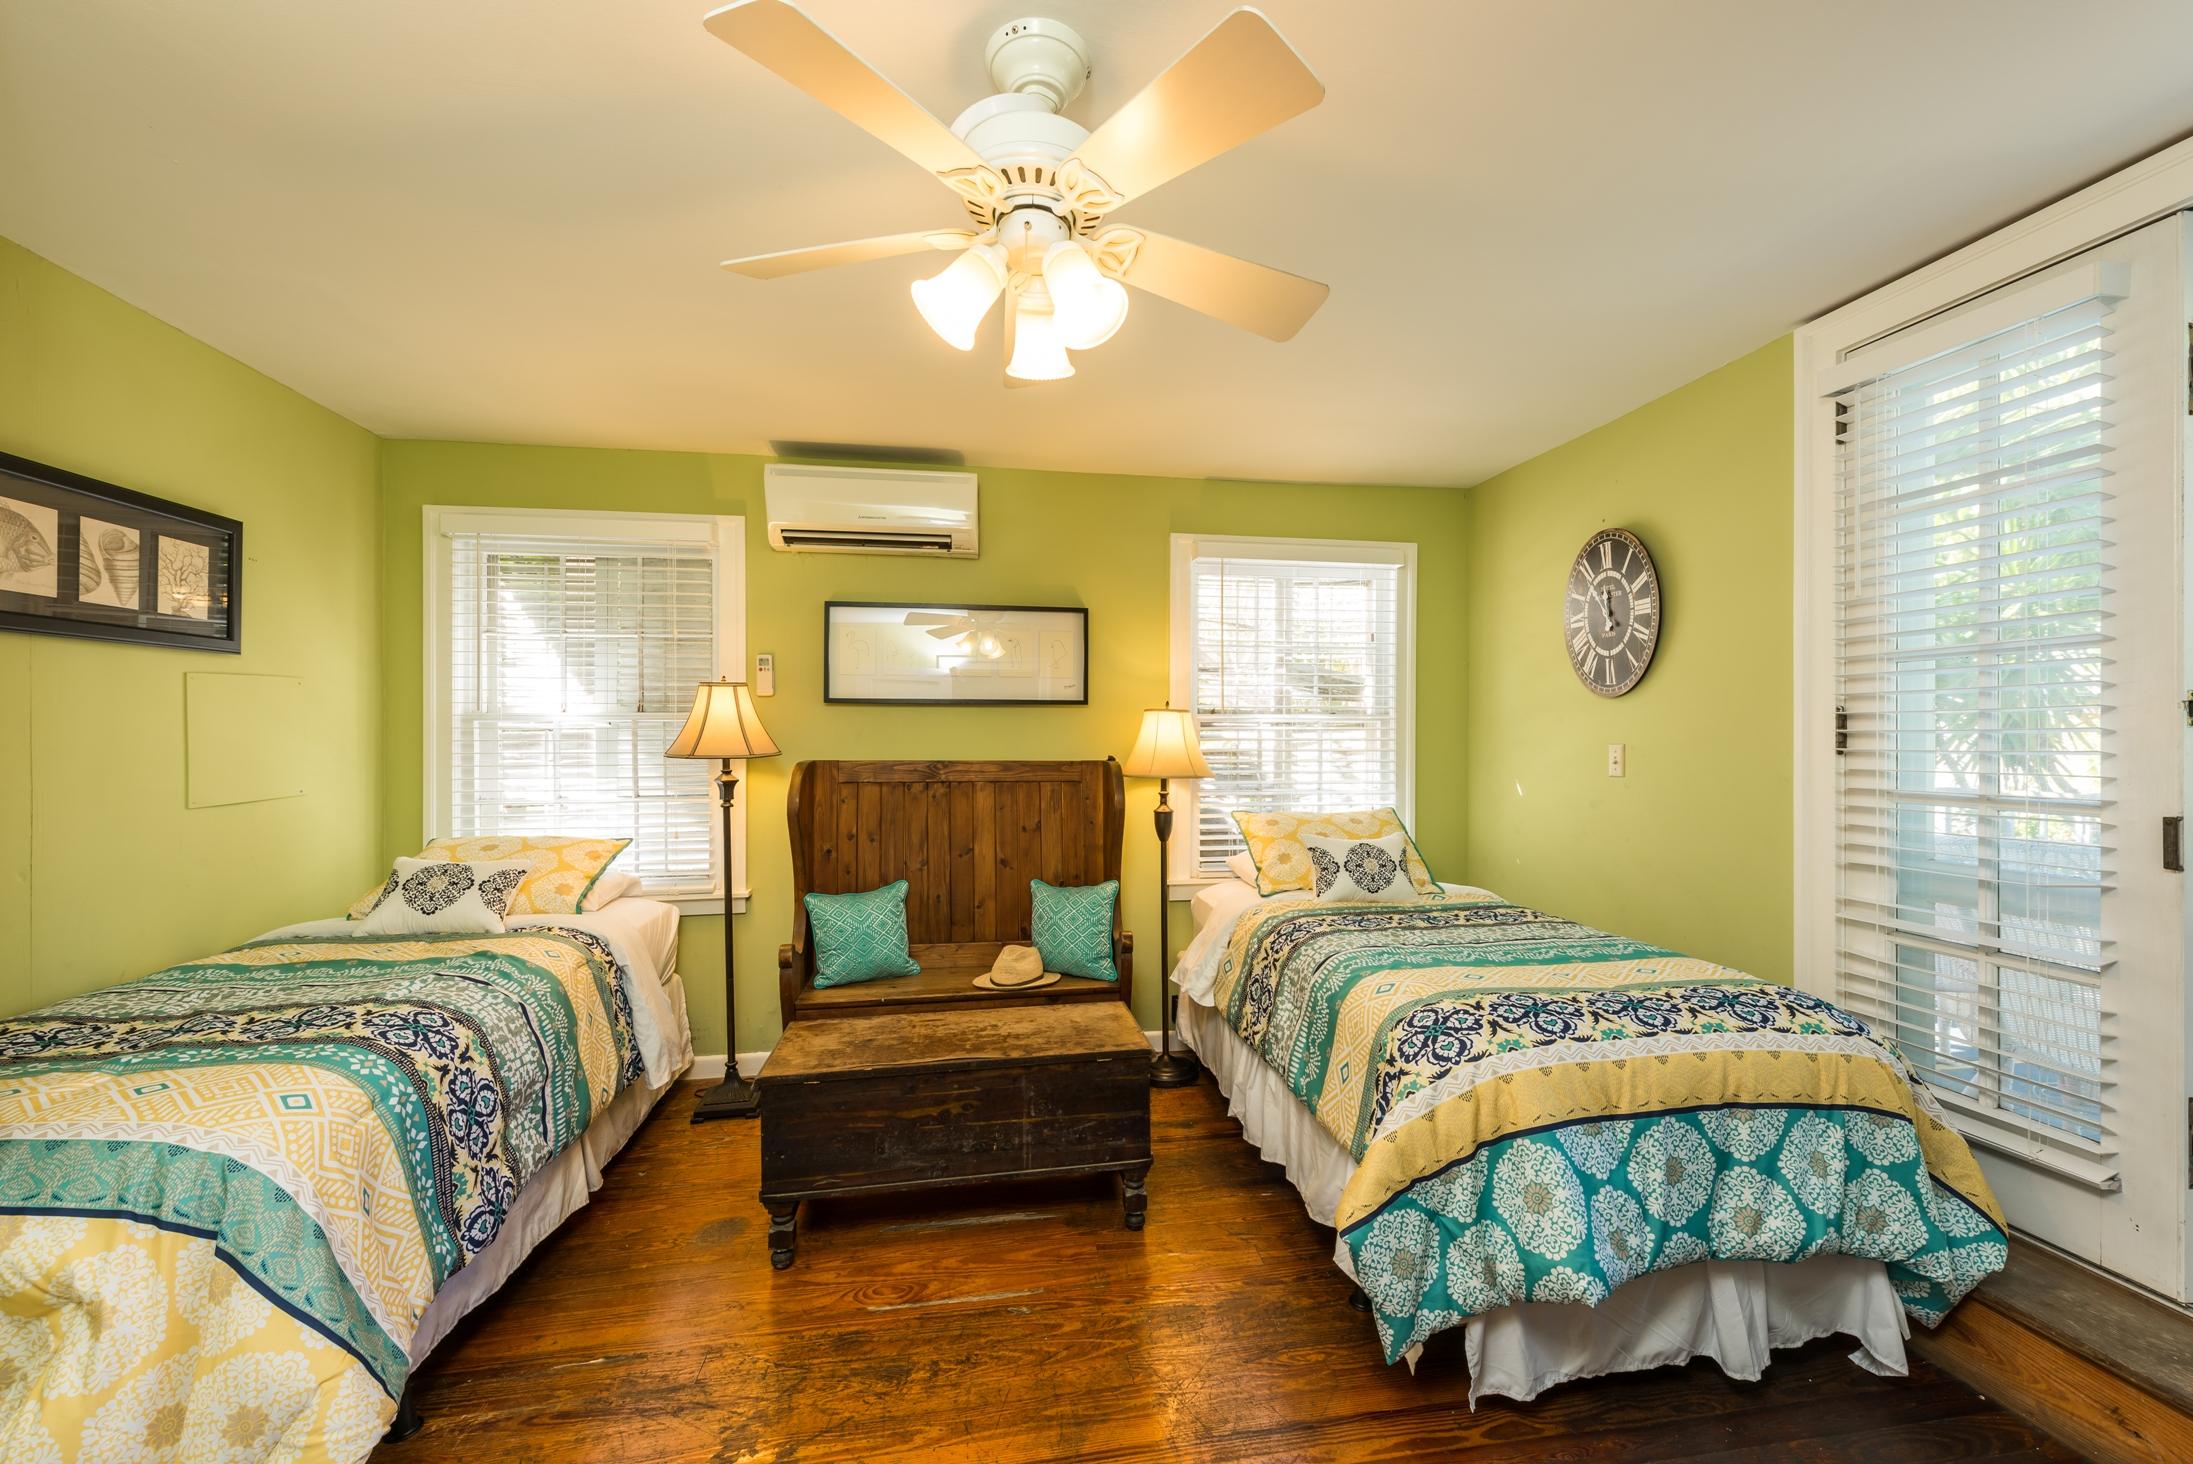 Key West Vacation Home - William Skelton House - Second Floor Twin Bedroom